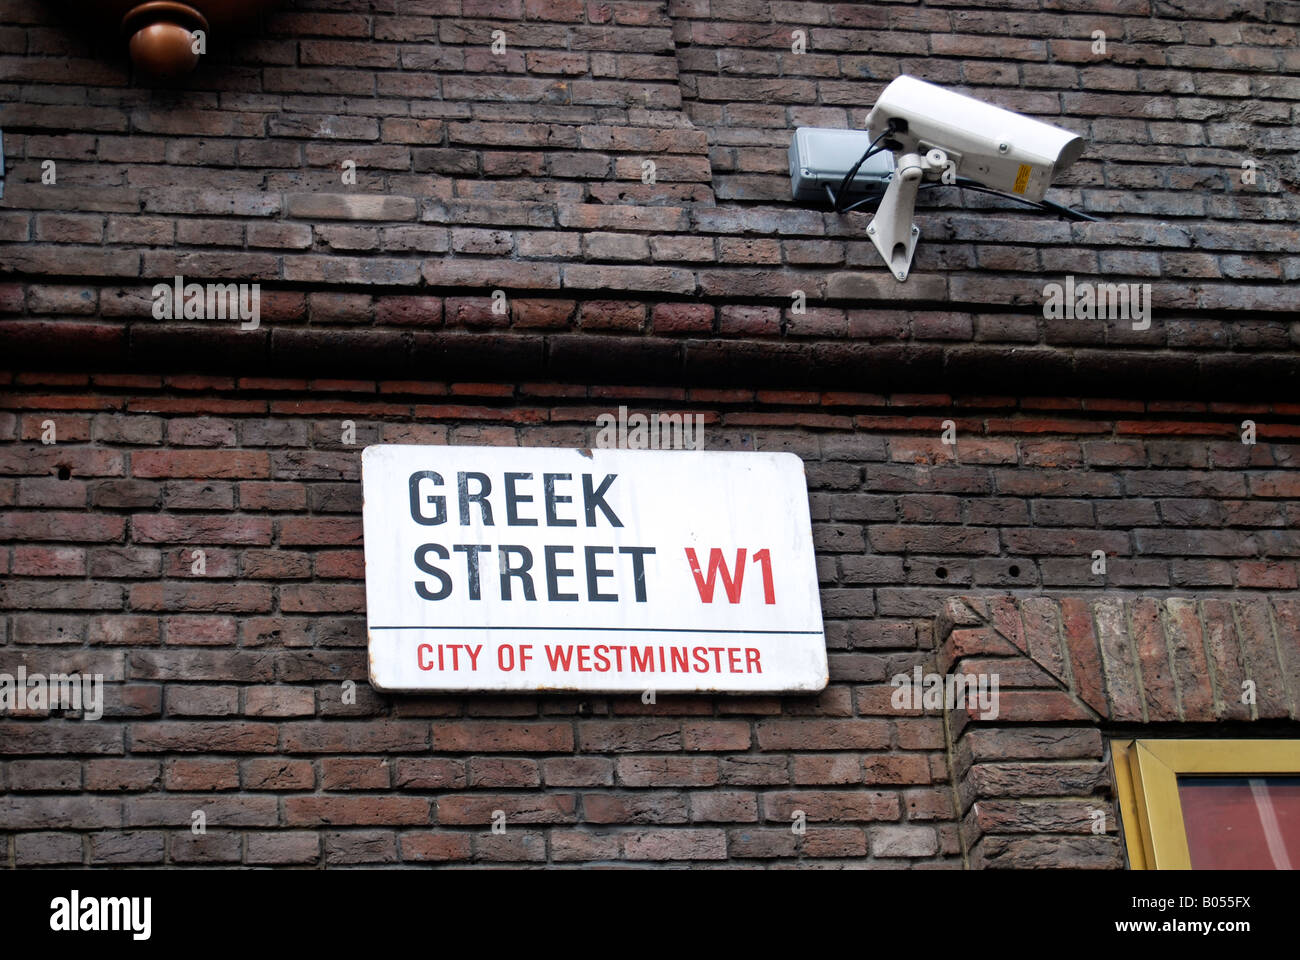 Greek street surveillance camera spy soho cctv camera - Stock Image